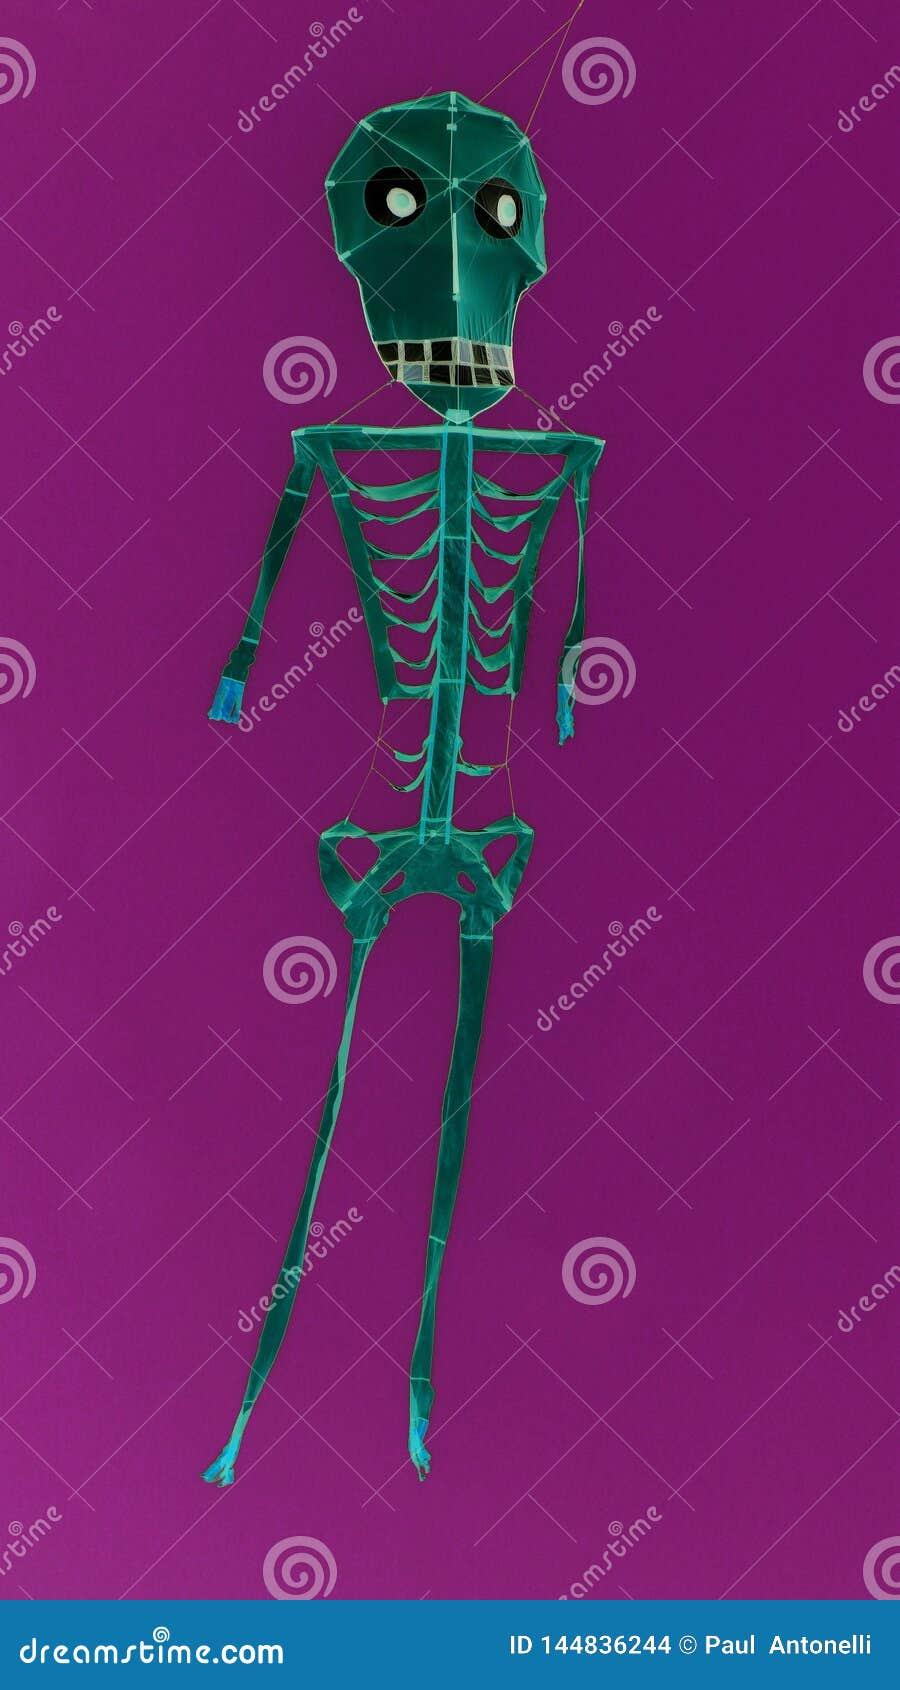 Papagaio de esqueleto assustador artístico